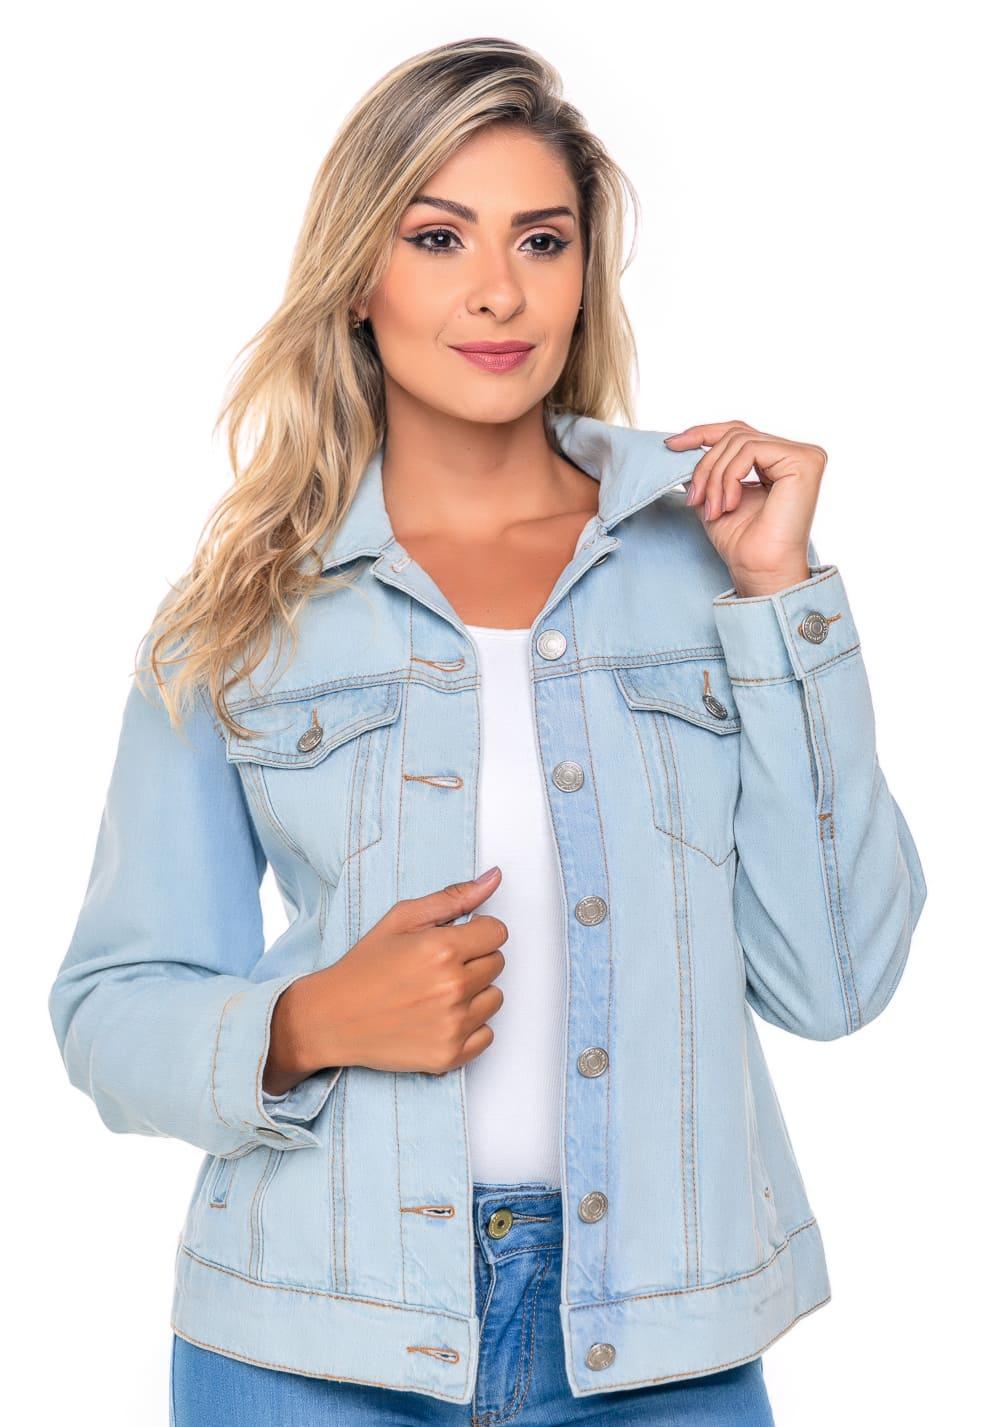 Jaqueta Jeans Feminina